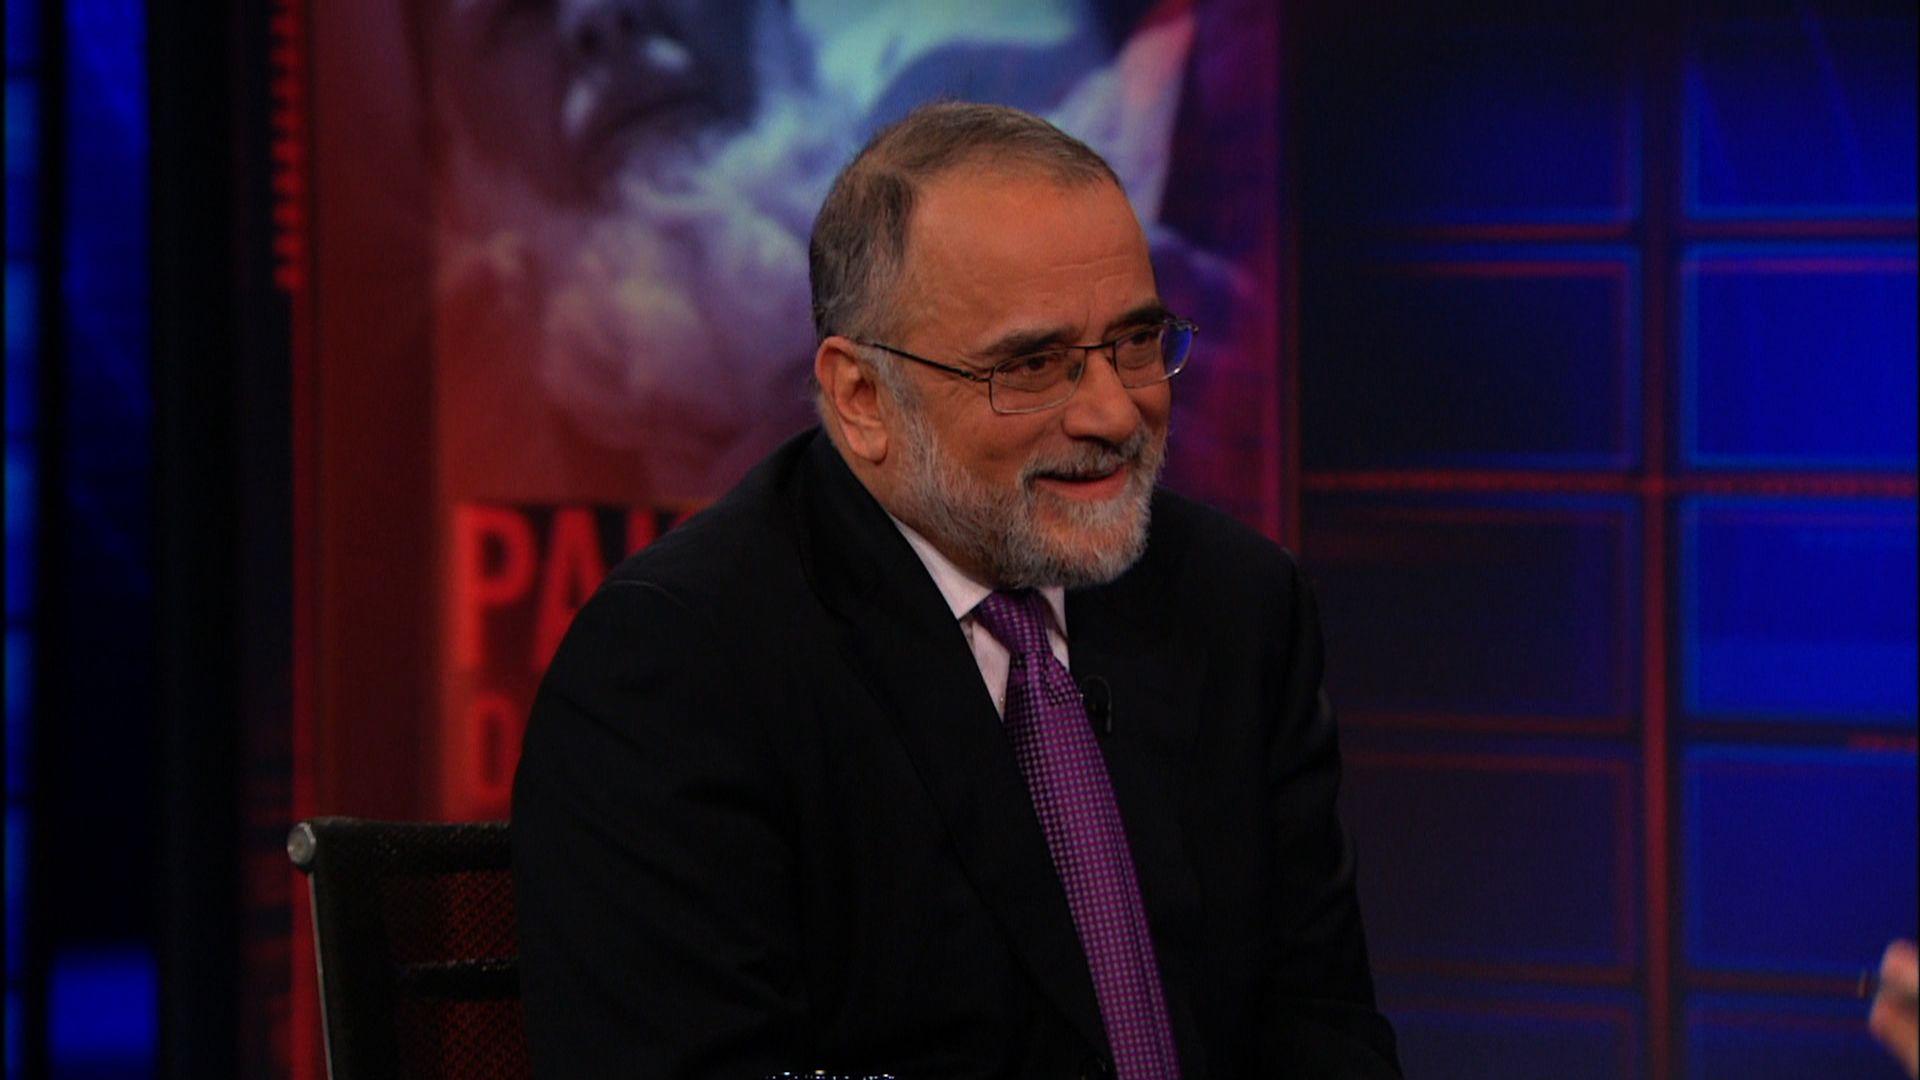 Ahmed Rashid - The Daily Show With Jon Stewart Video Clip -6273